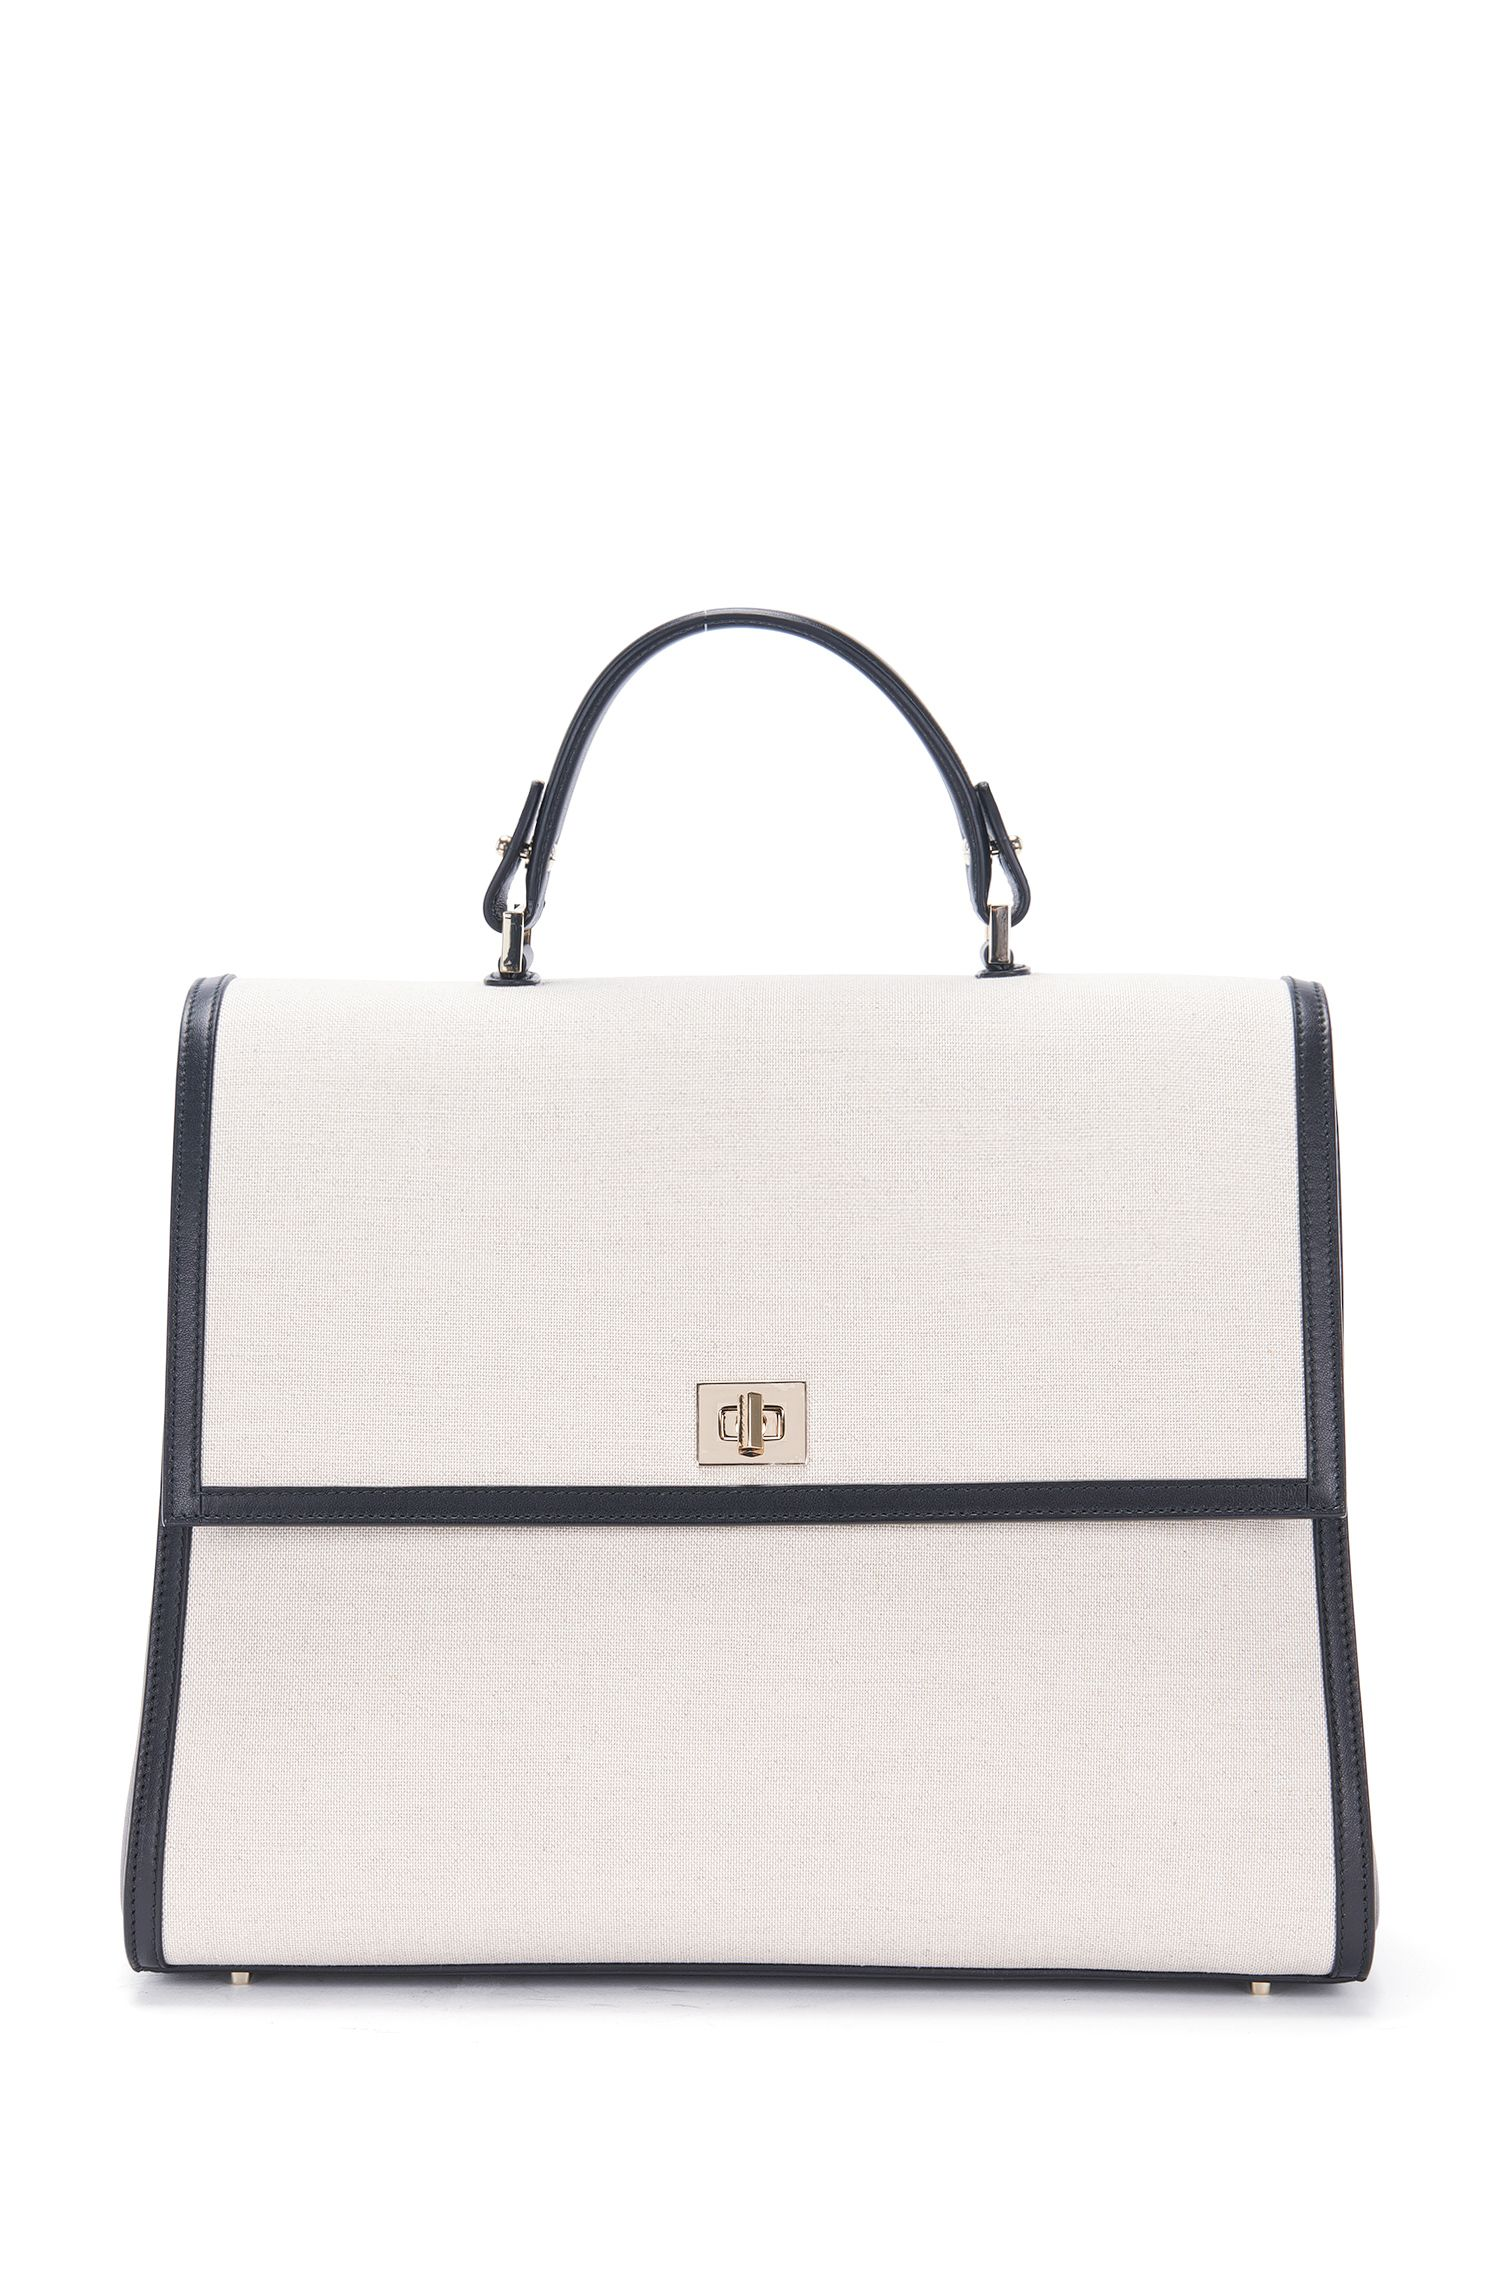 'BOSS Bespoke TH M SC' | Cotton Linen Leather Handbag, Detachable Strap